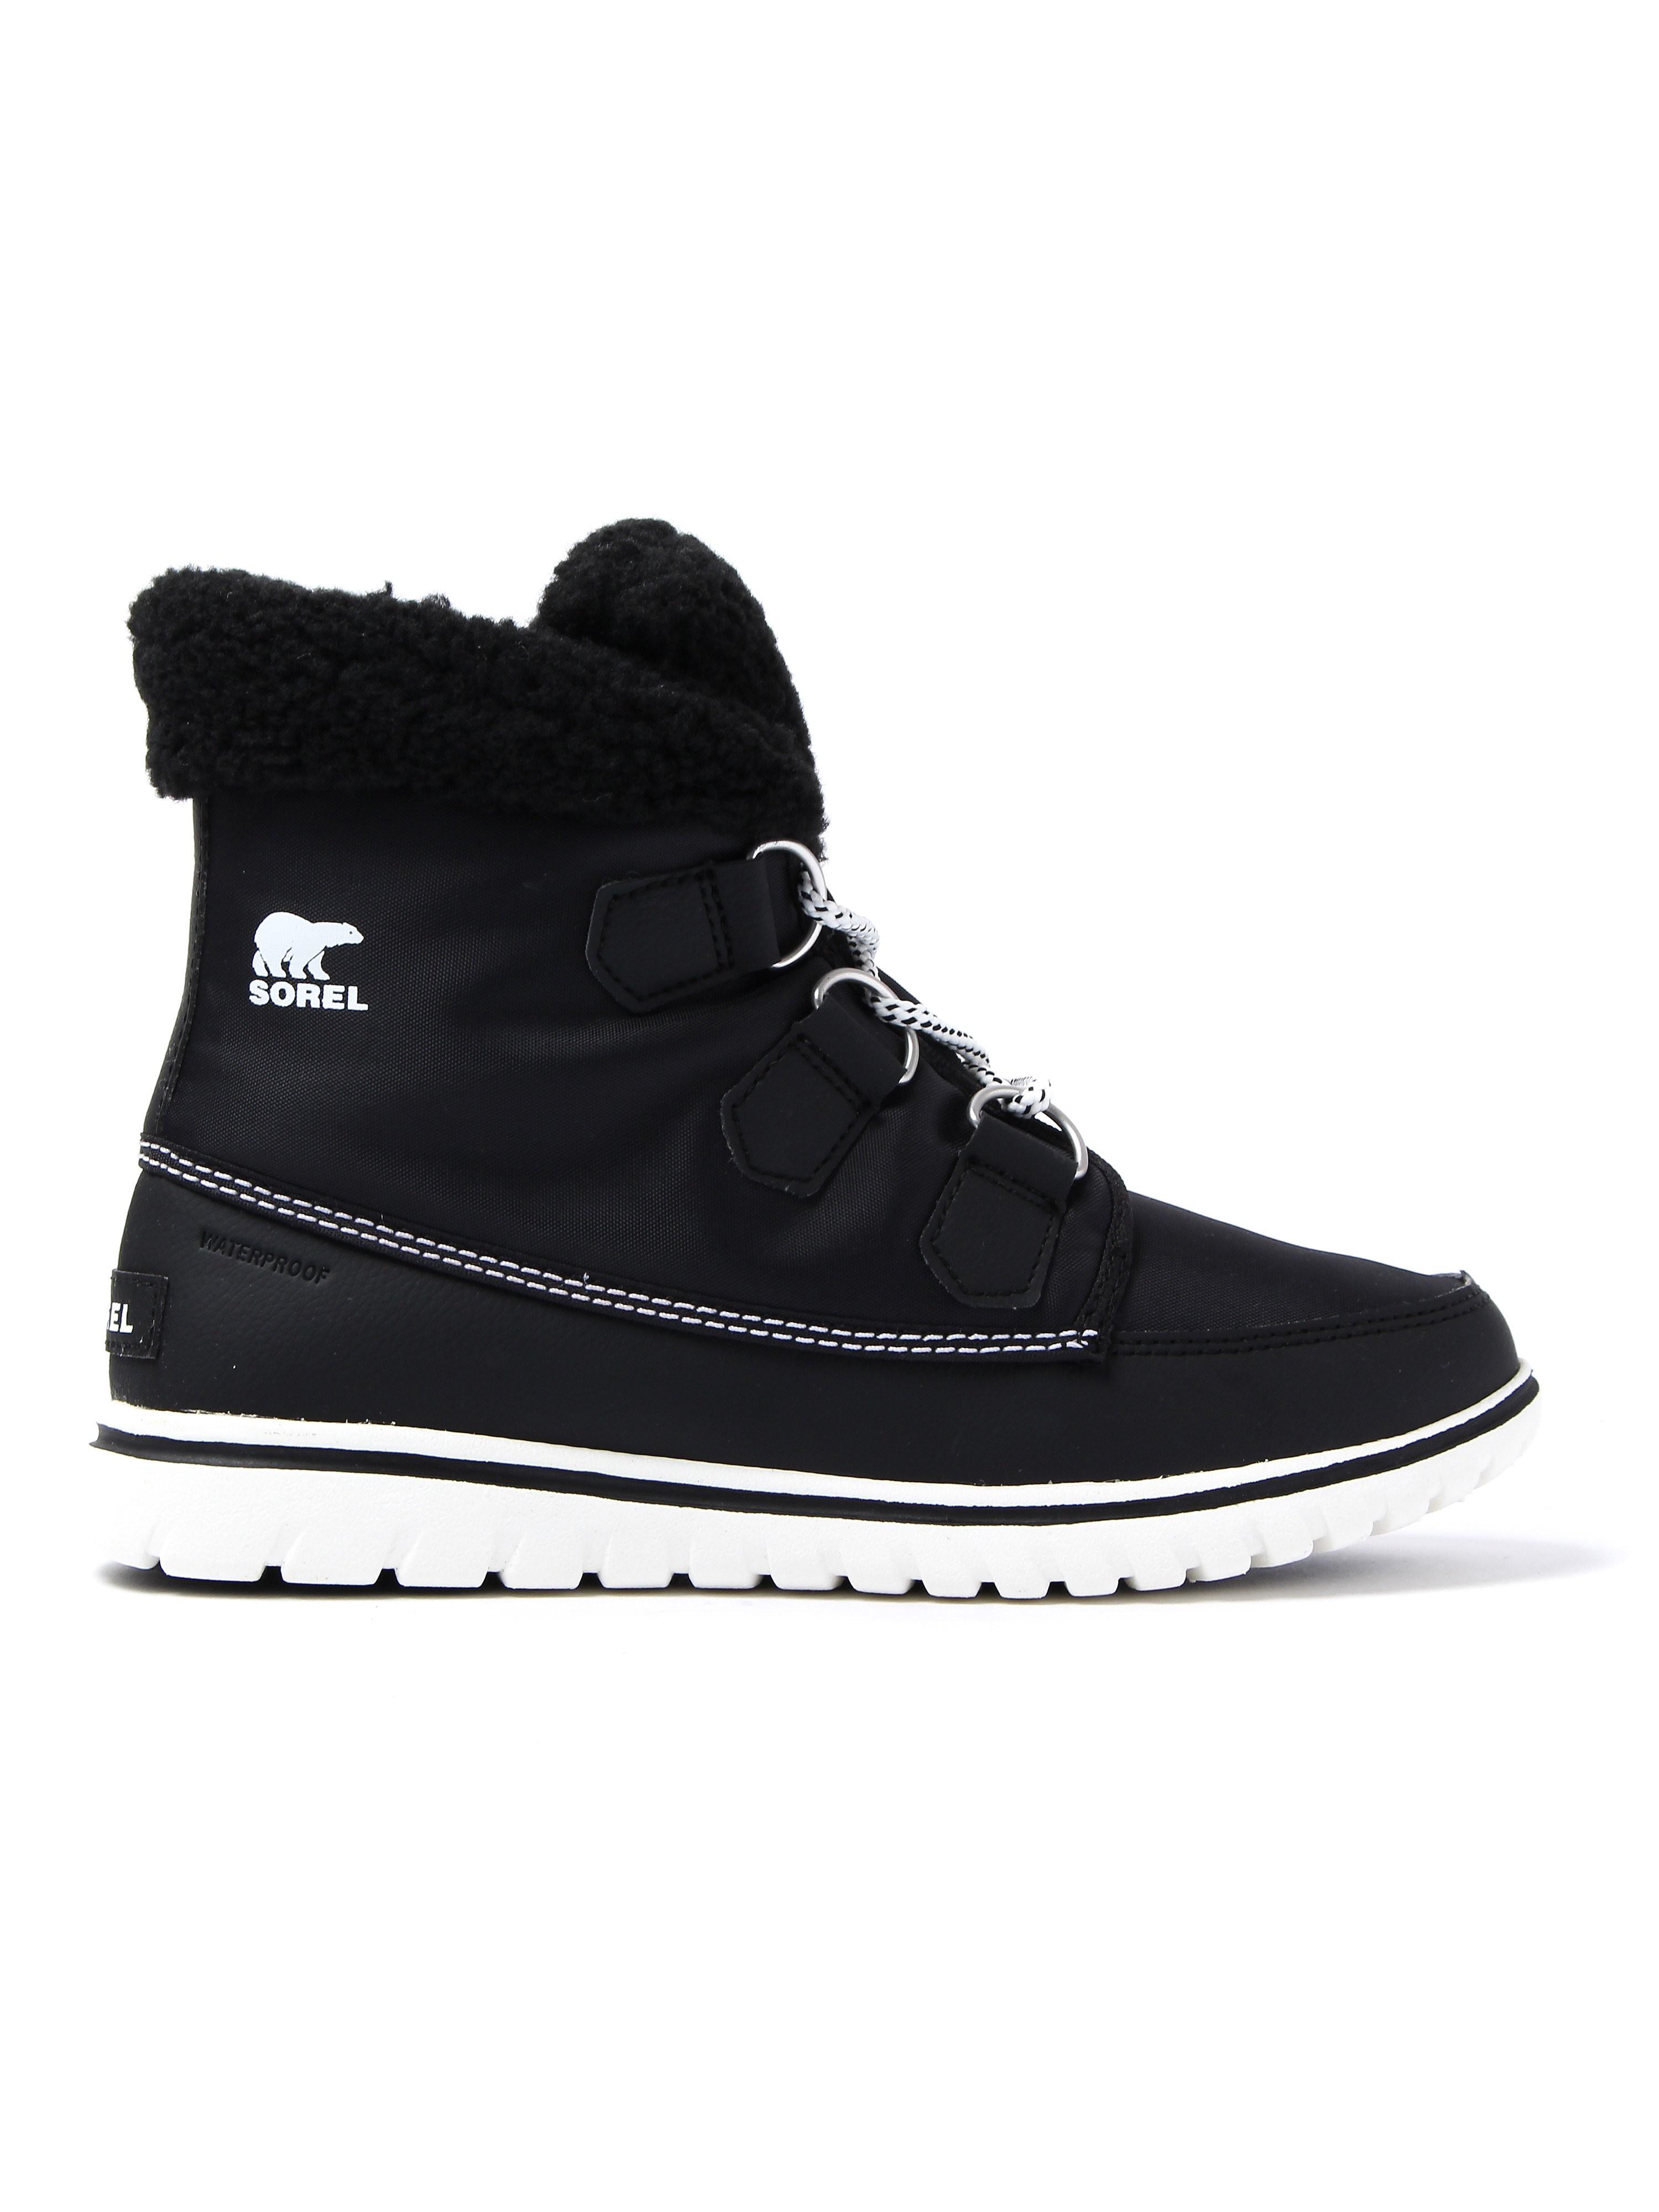 Sorel Women's Cozy Carnival Boots - Black